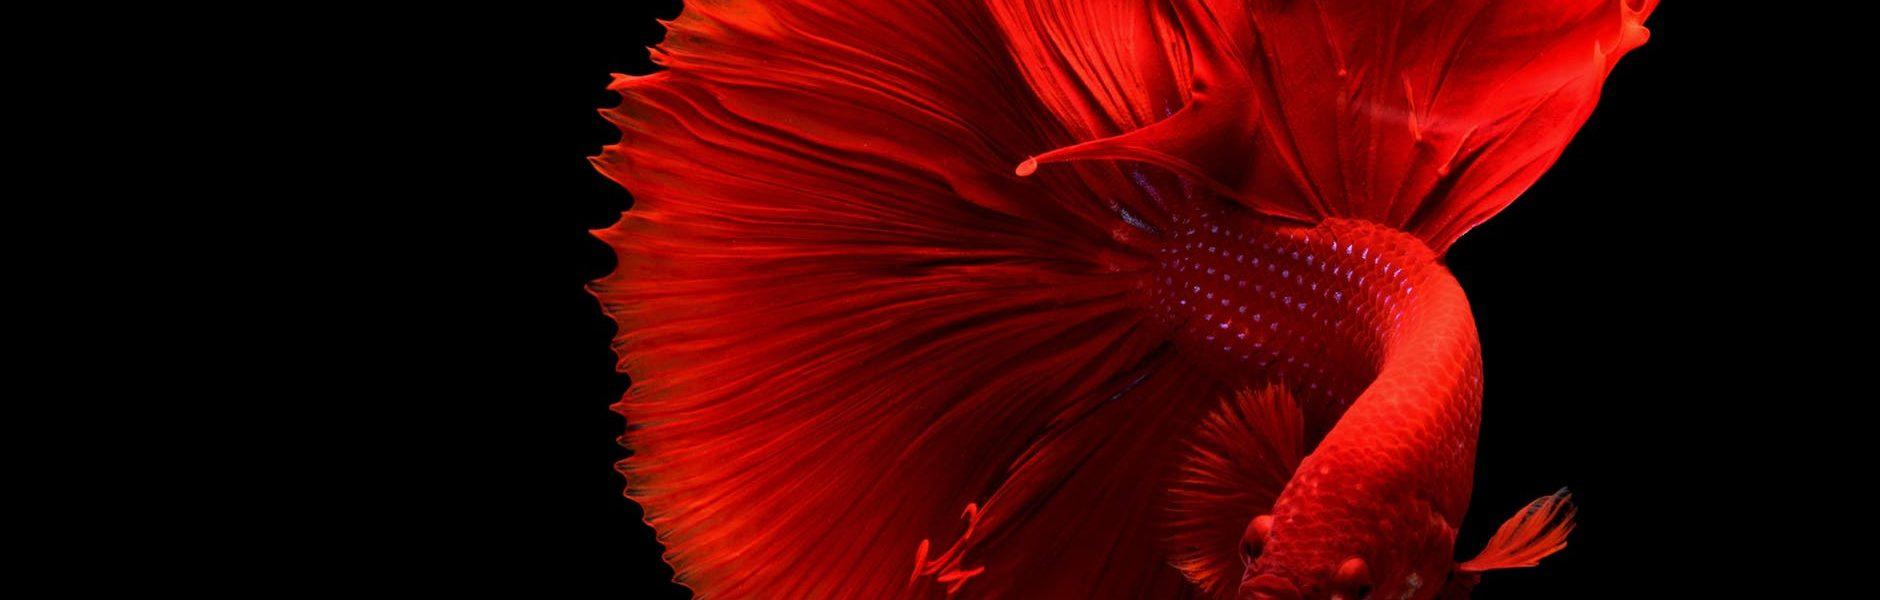 czy ryba ma serce?